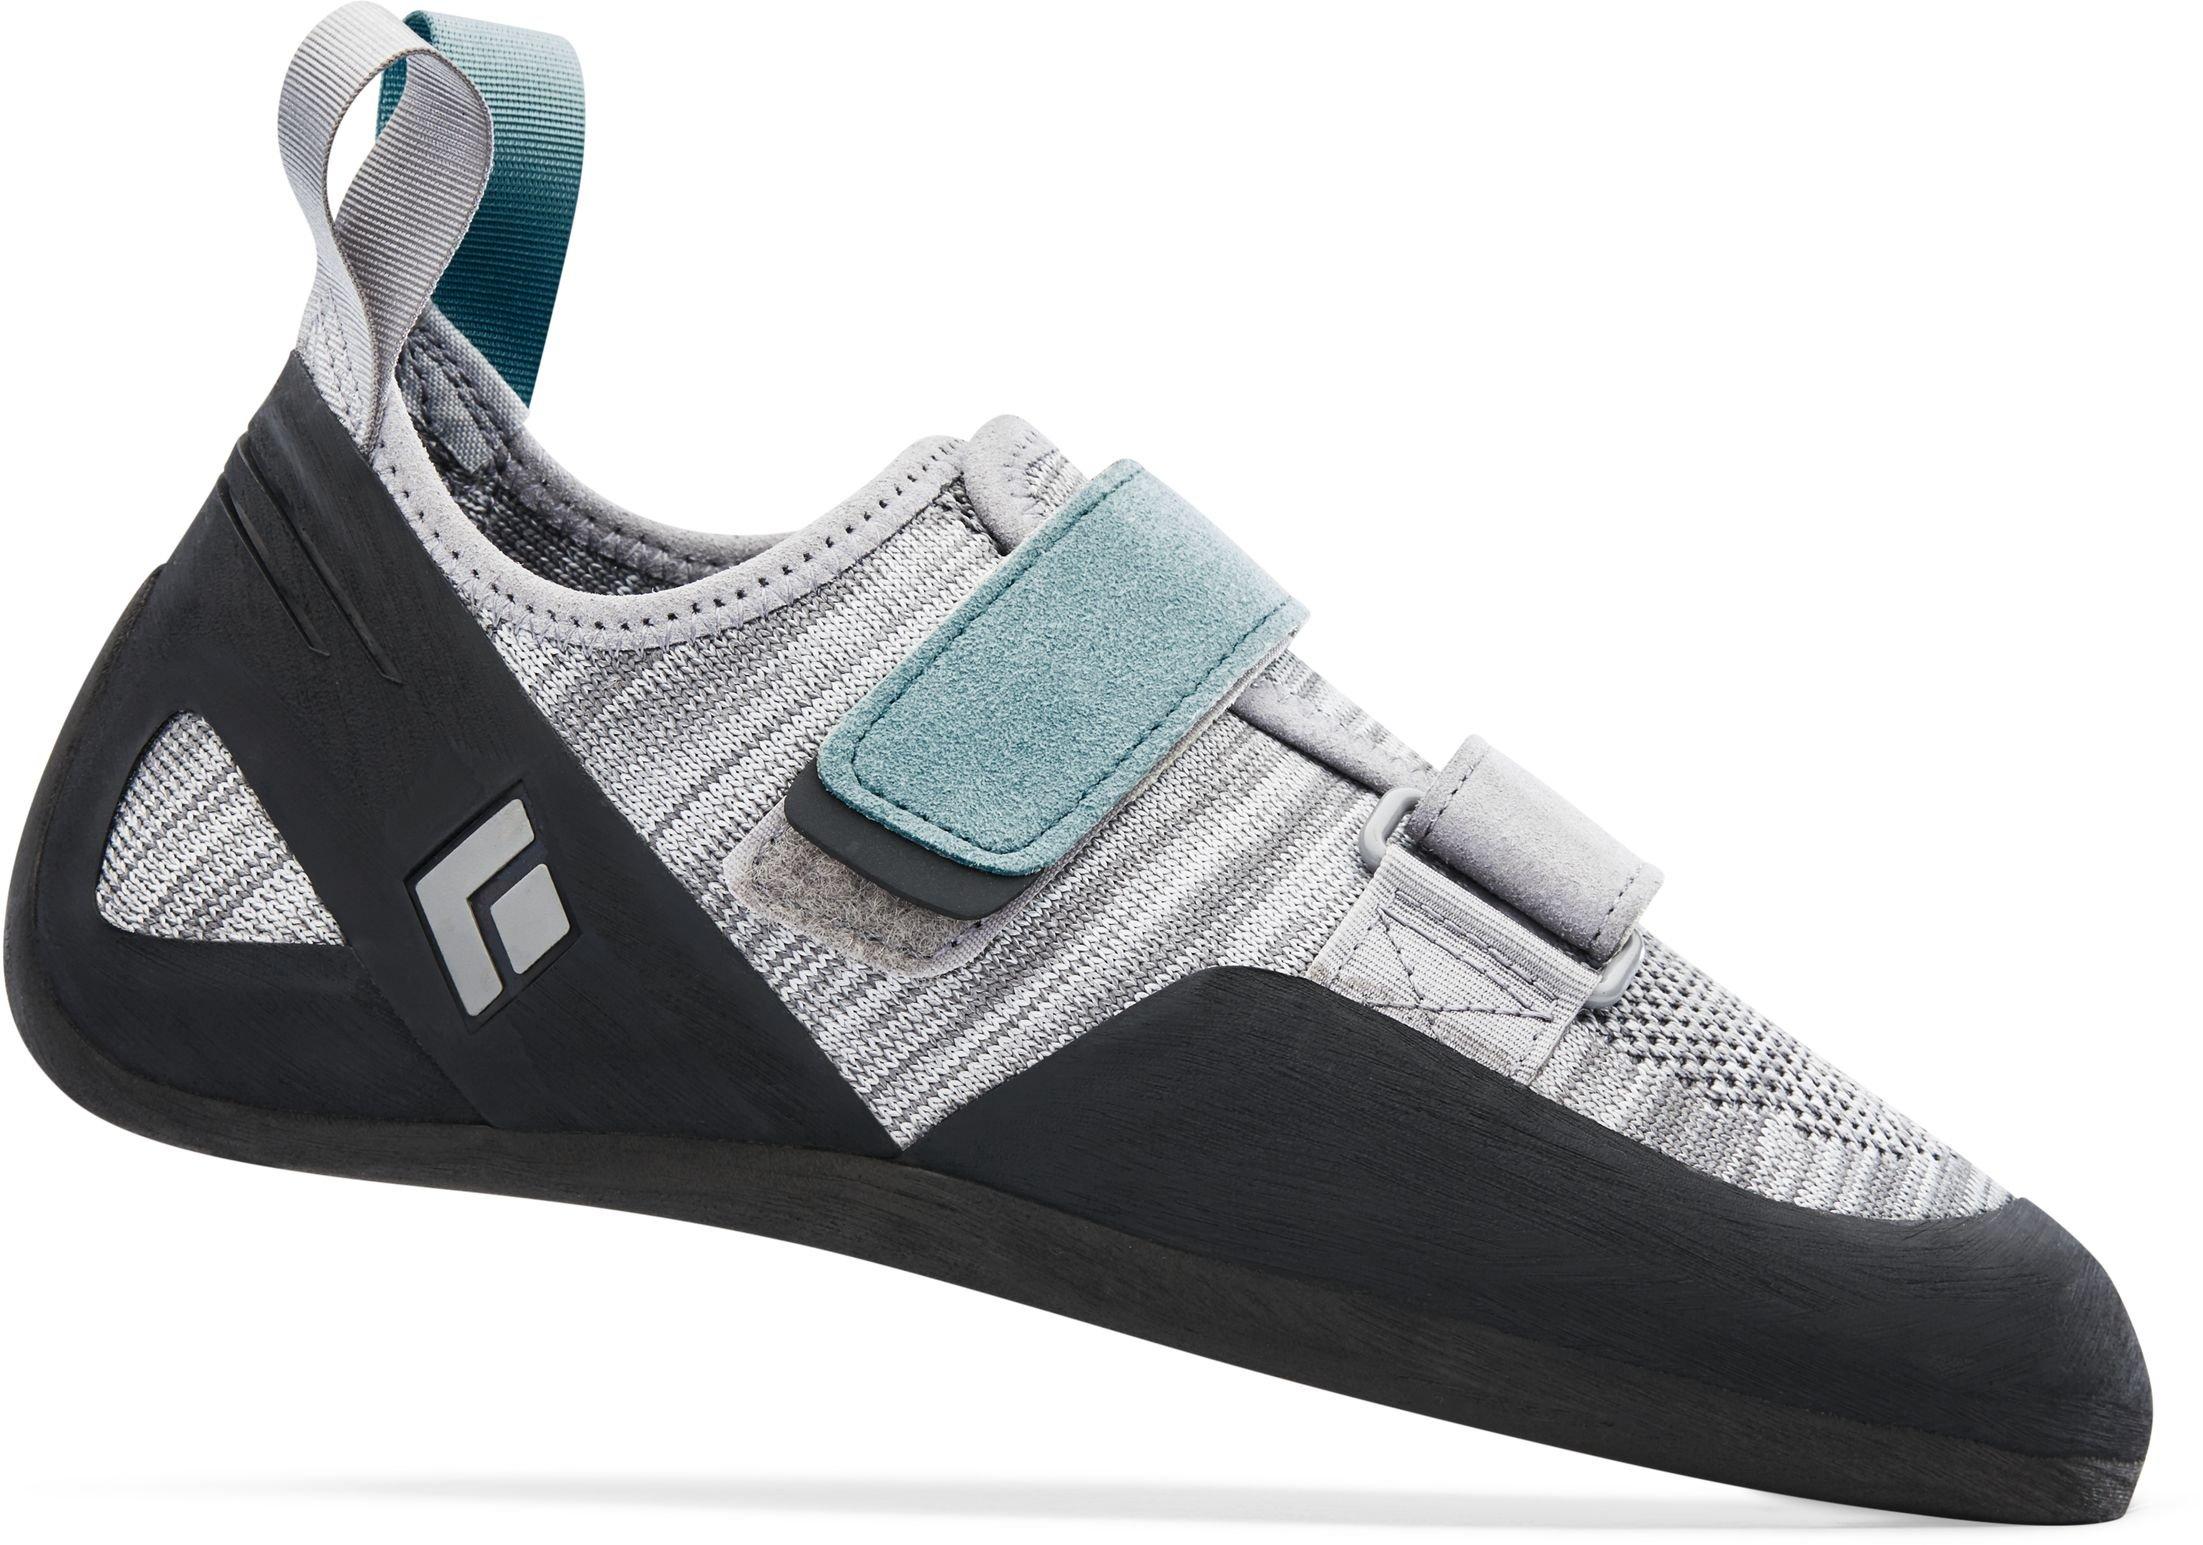 Black Diamond Momentum Climbing Shoe - Women's Aluminum 7.5